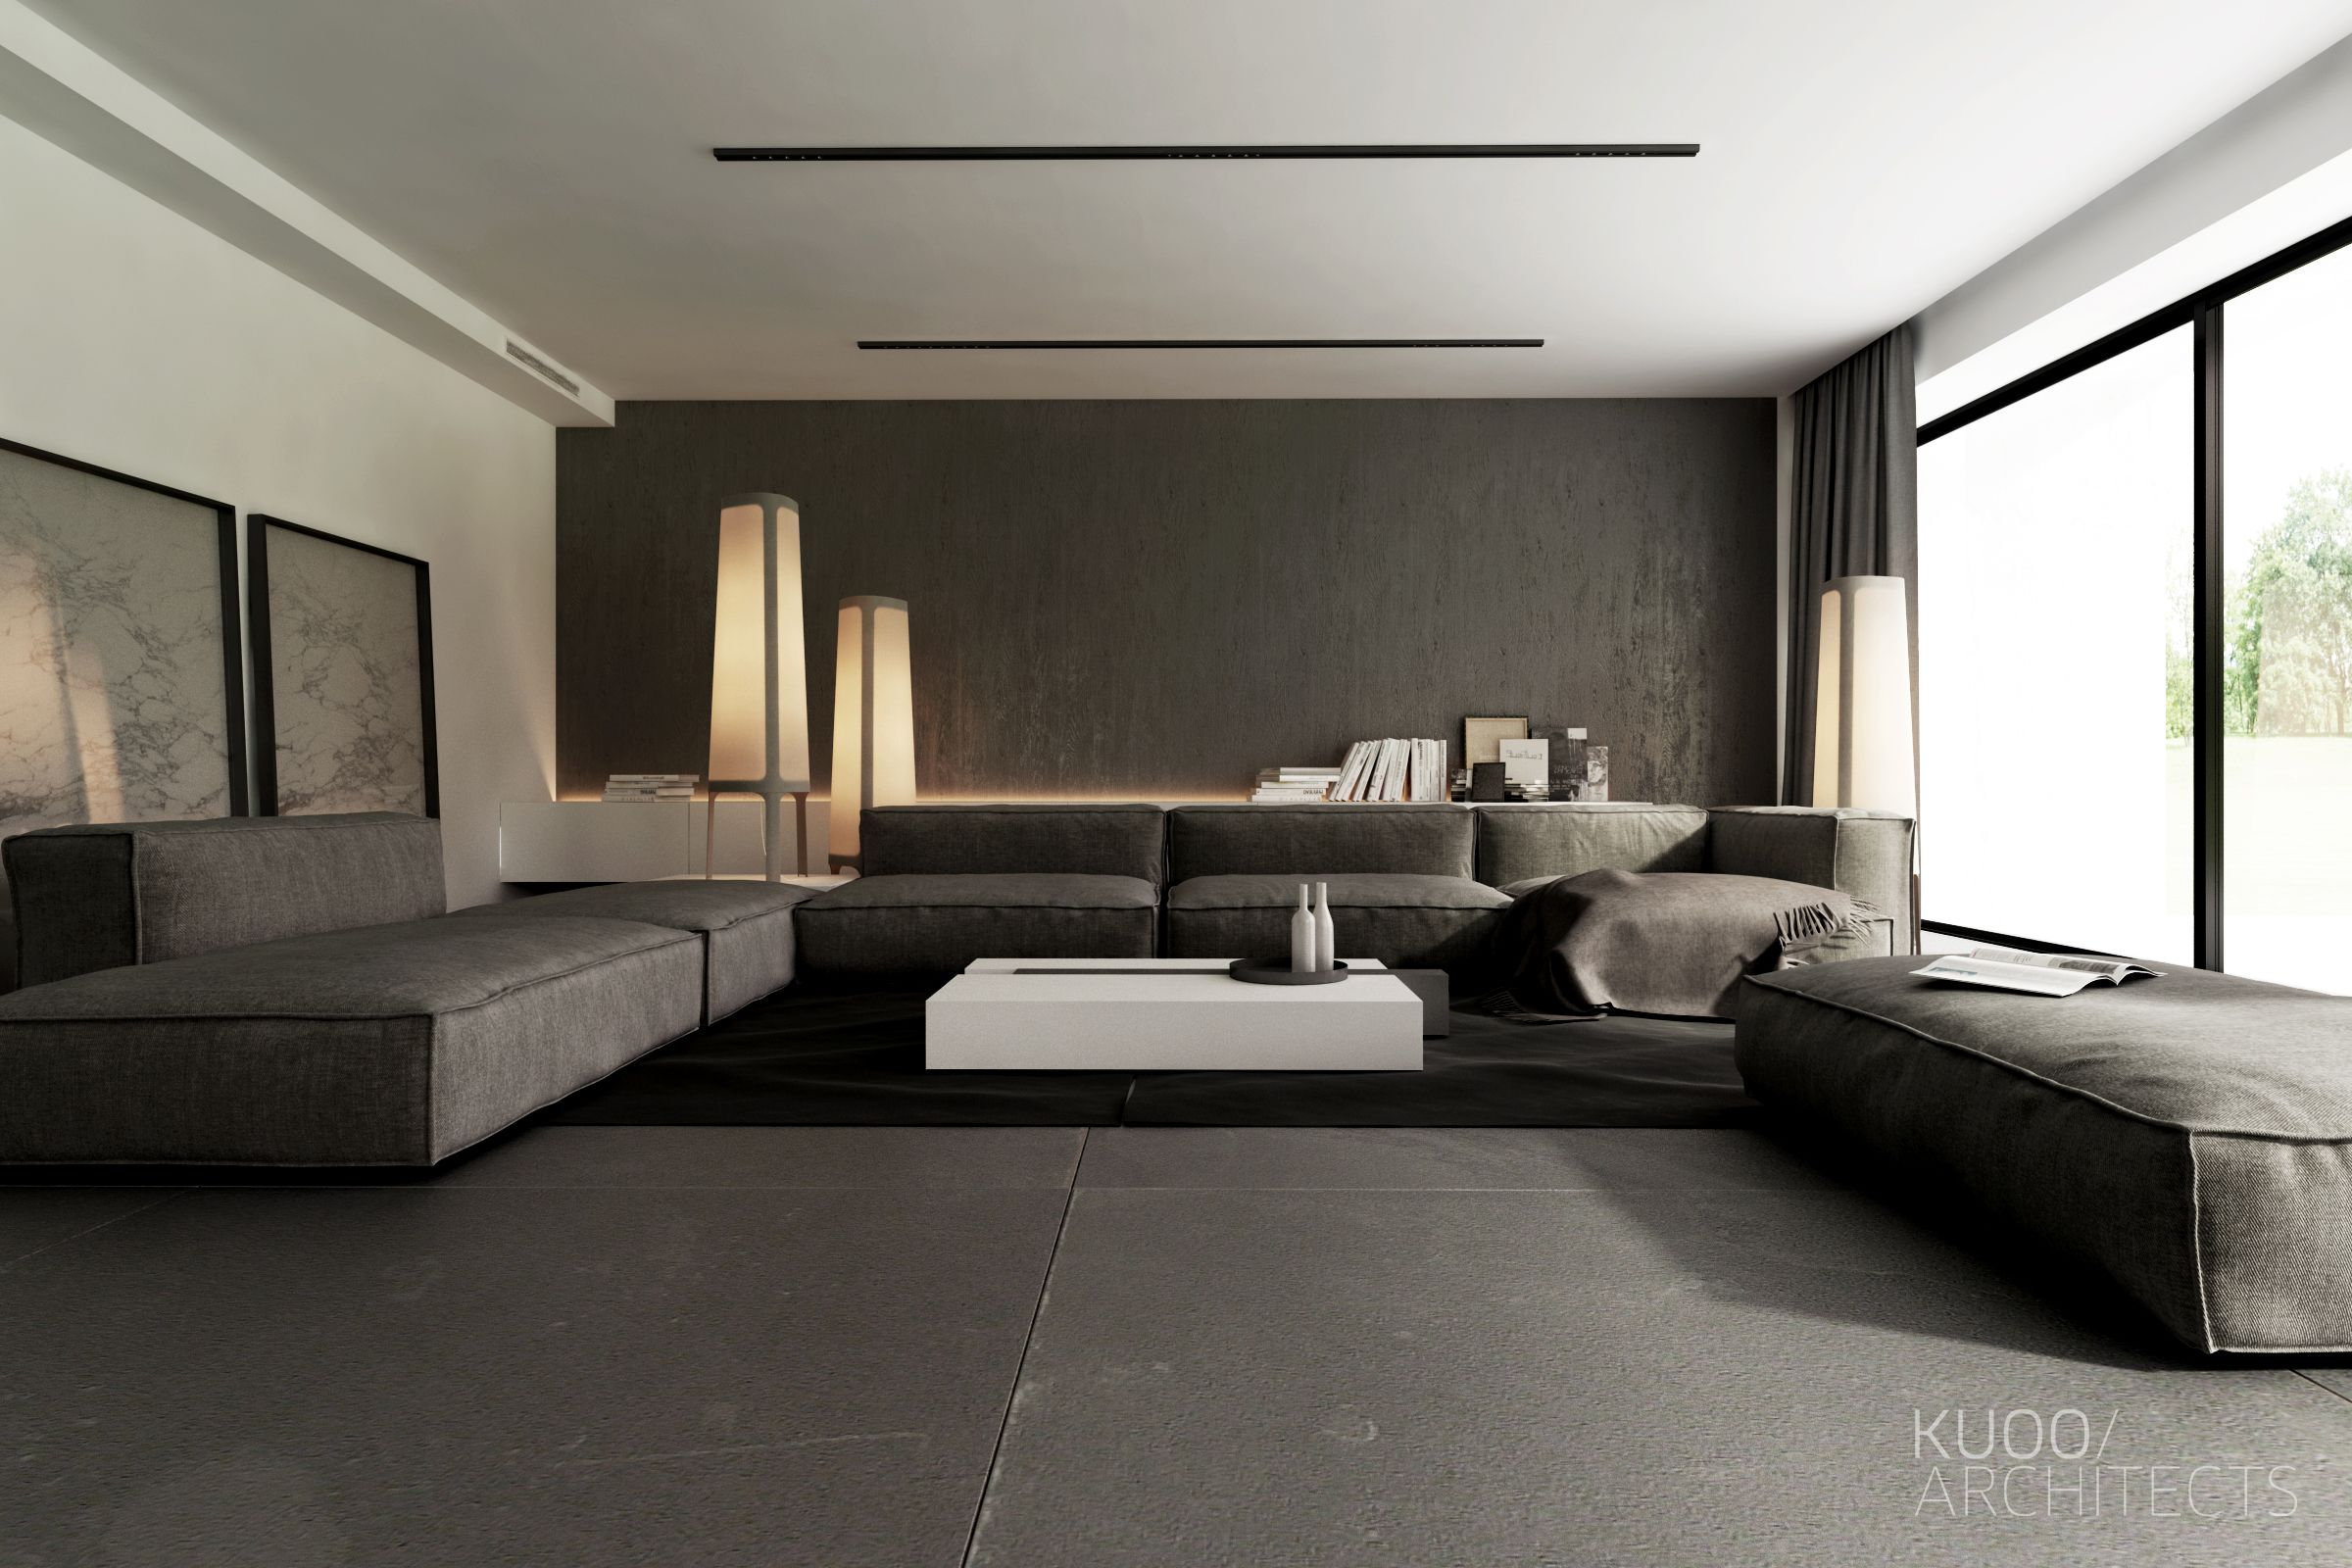 kuoo_architects_interior_design_minimal_contemporary (9) logo